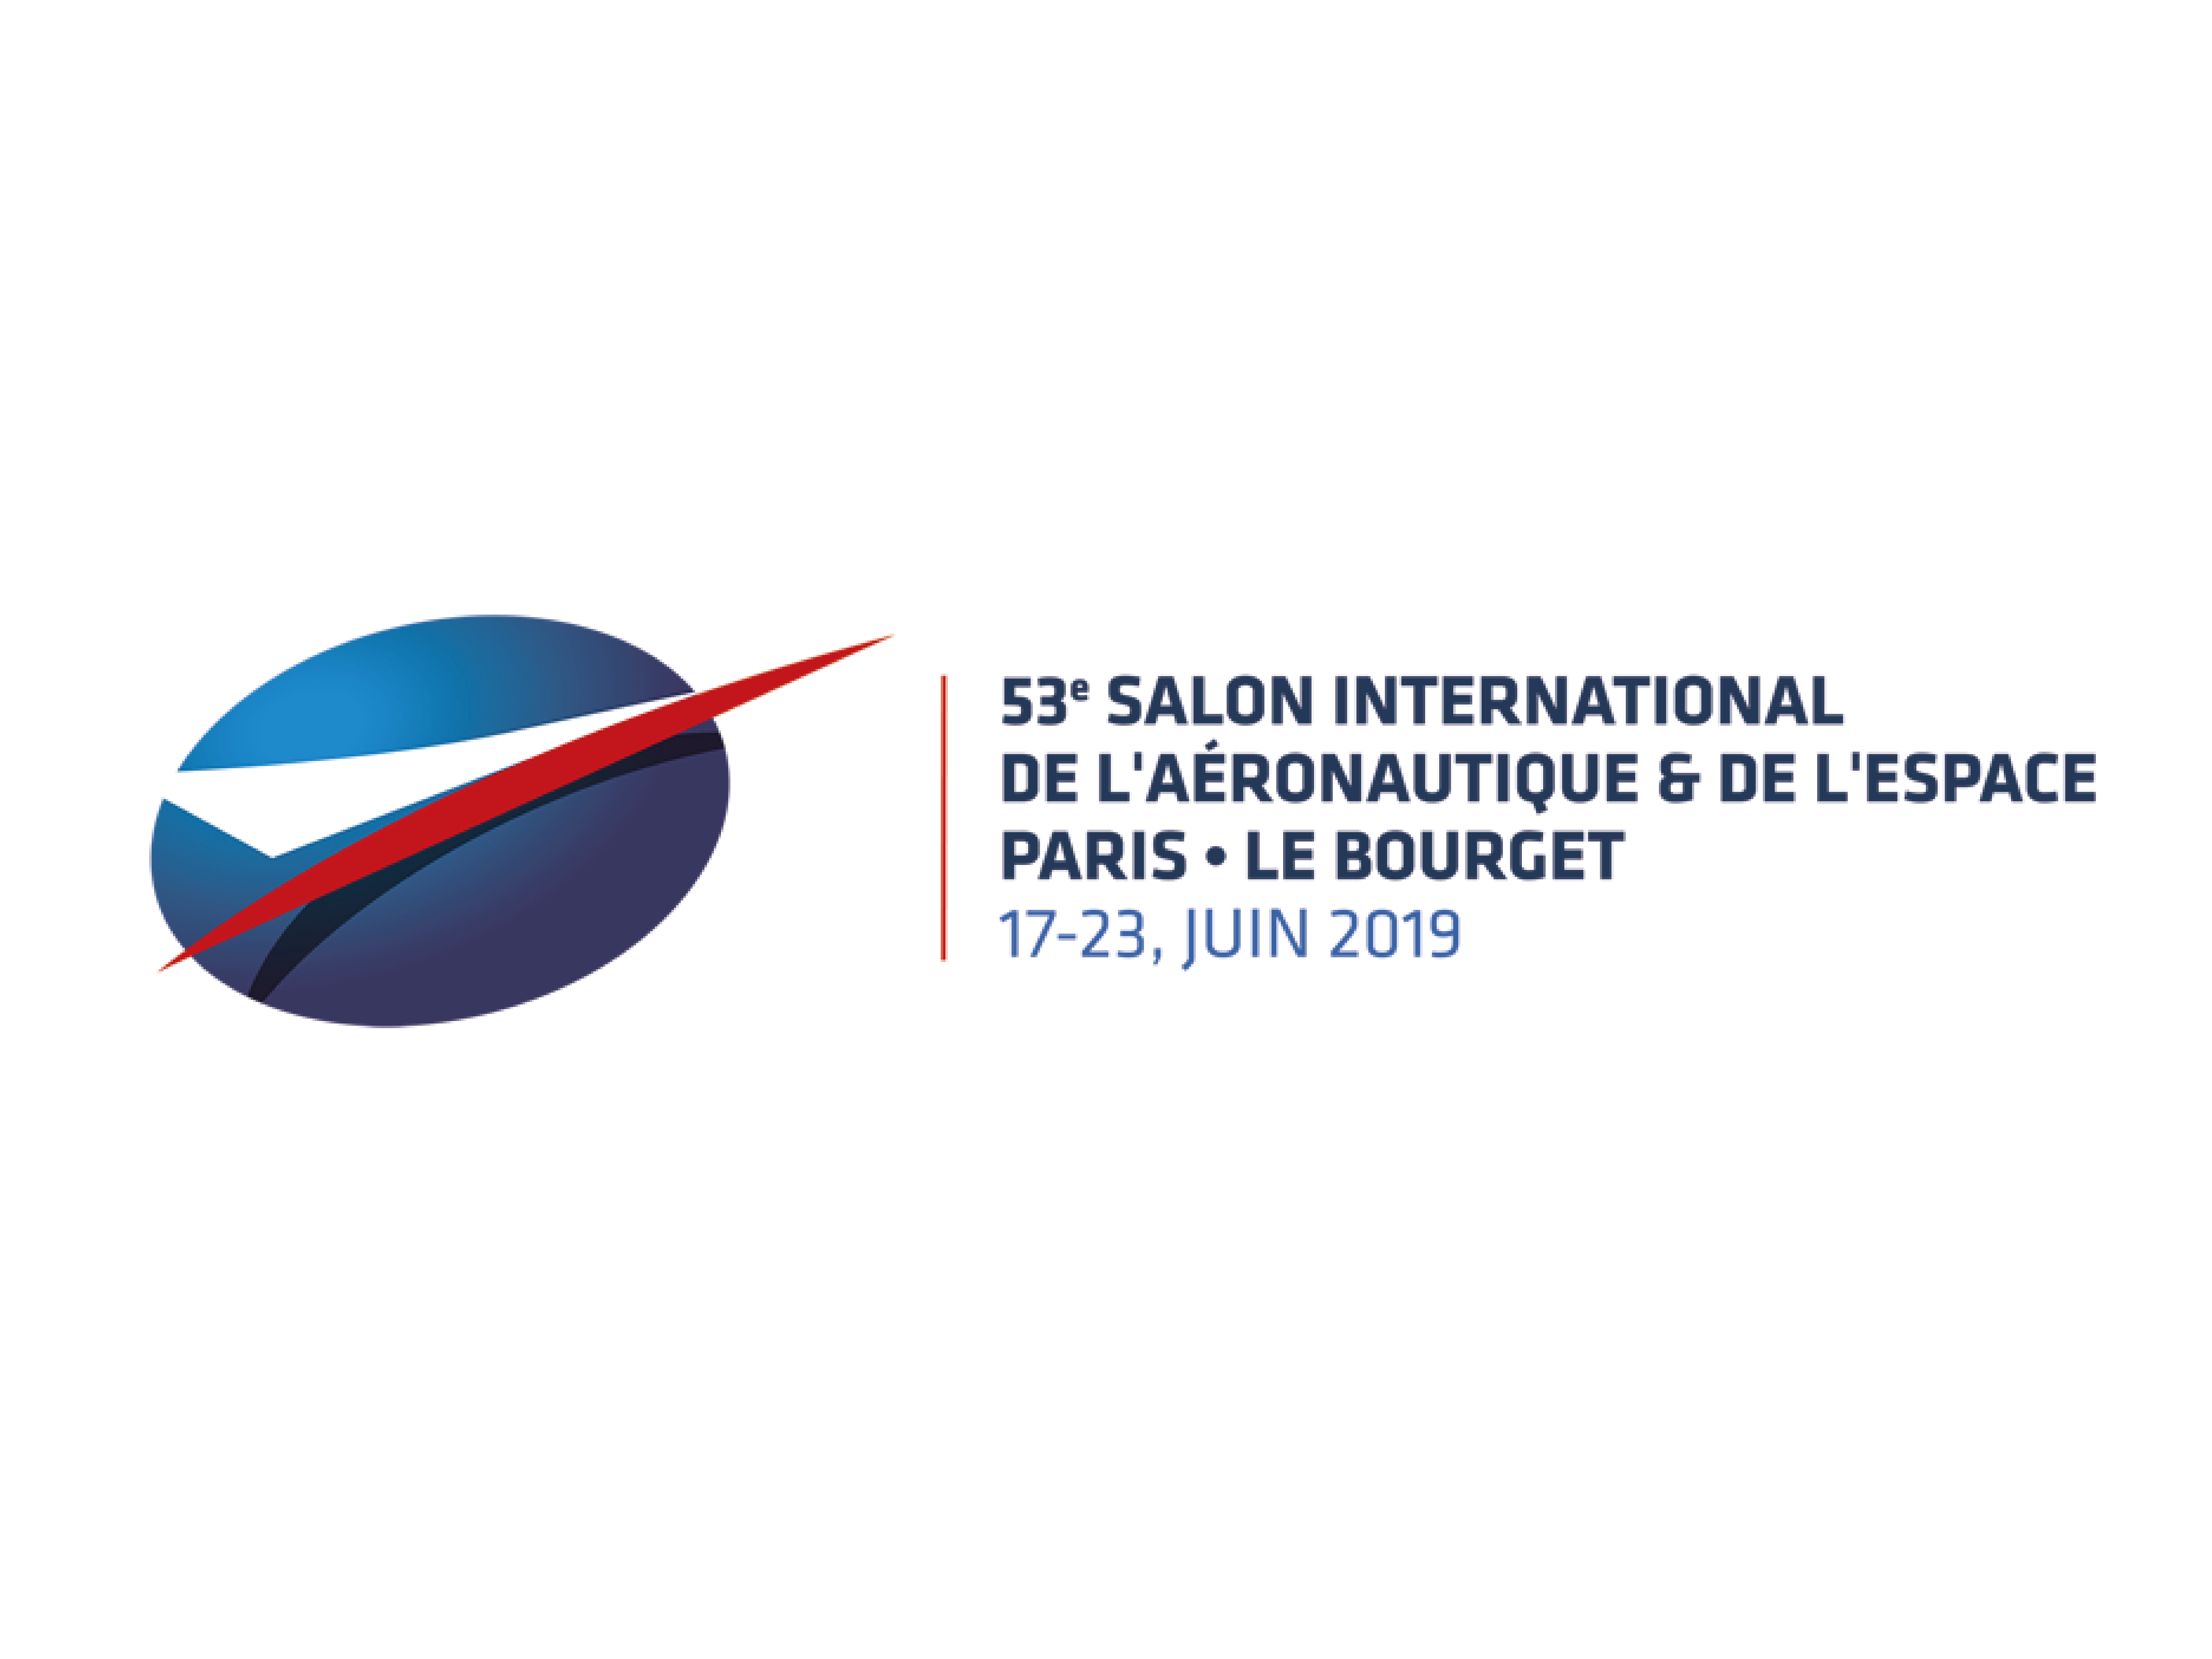 LOGO SALON DU BOURGET 17-23 JUIN 2019